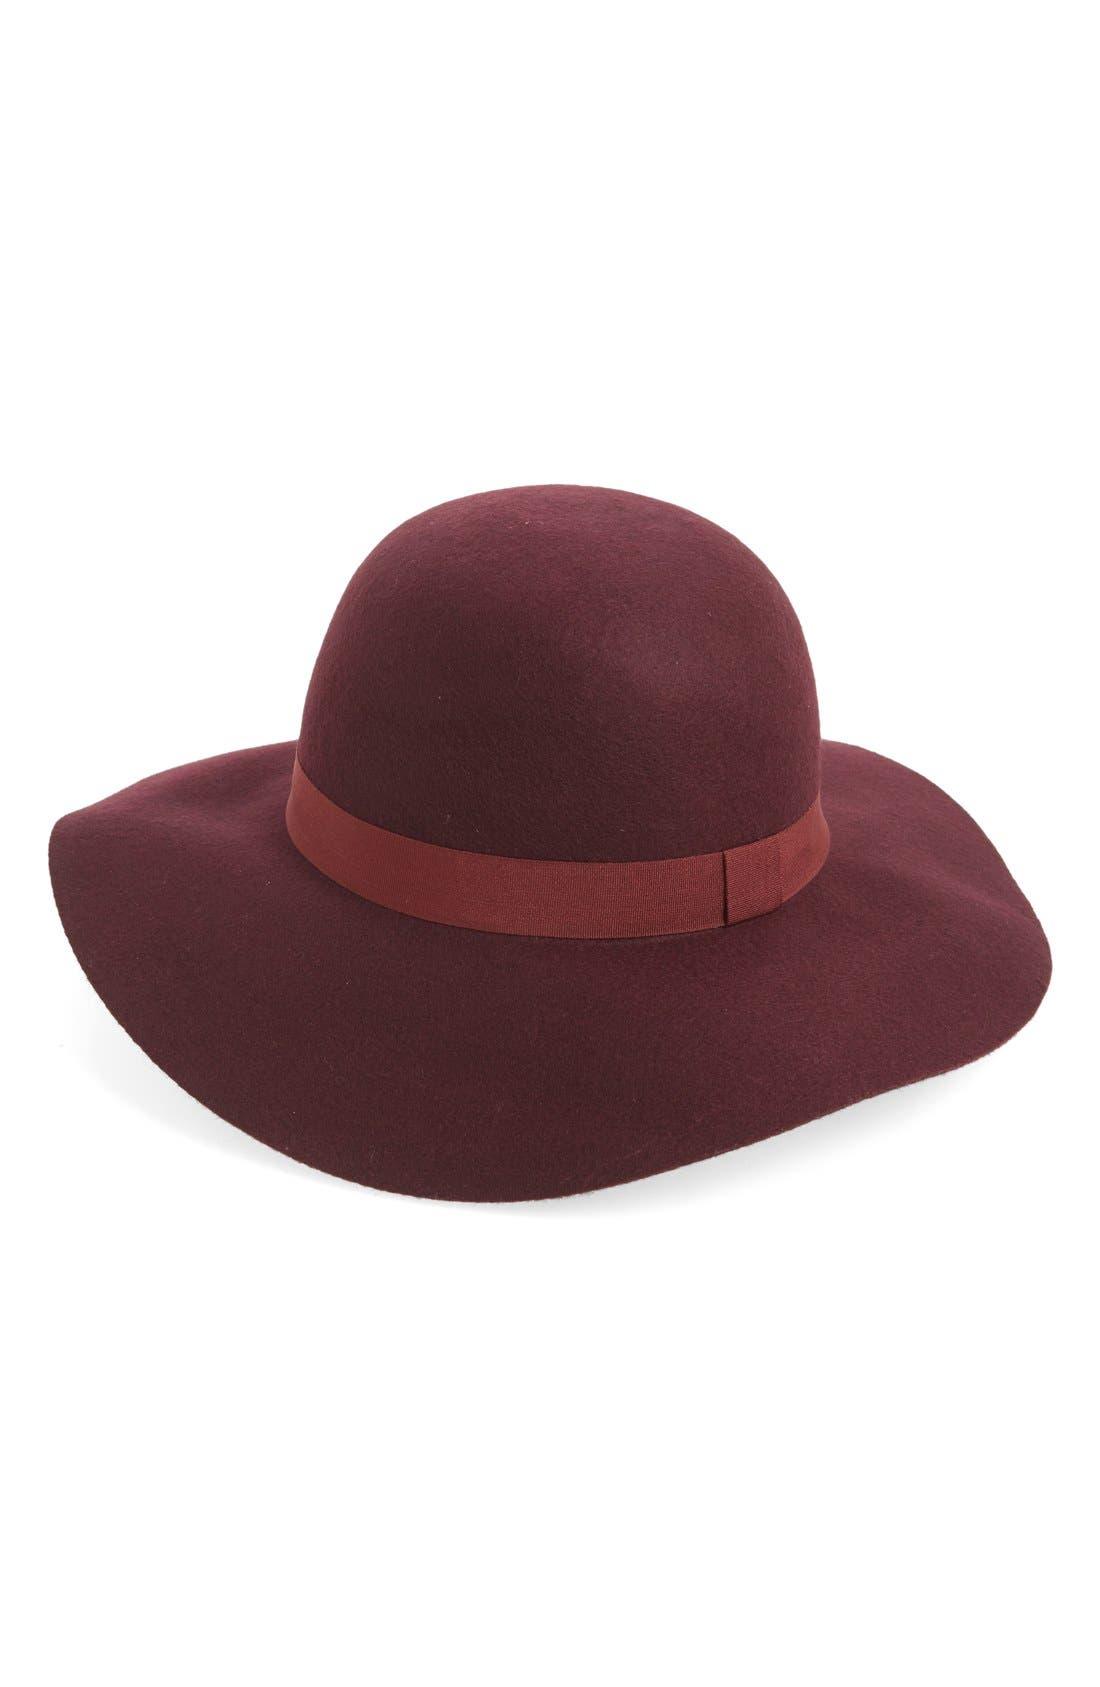 Ribbon Trim Felt Floppy Hat,                         Main,                         color, Burgundy